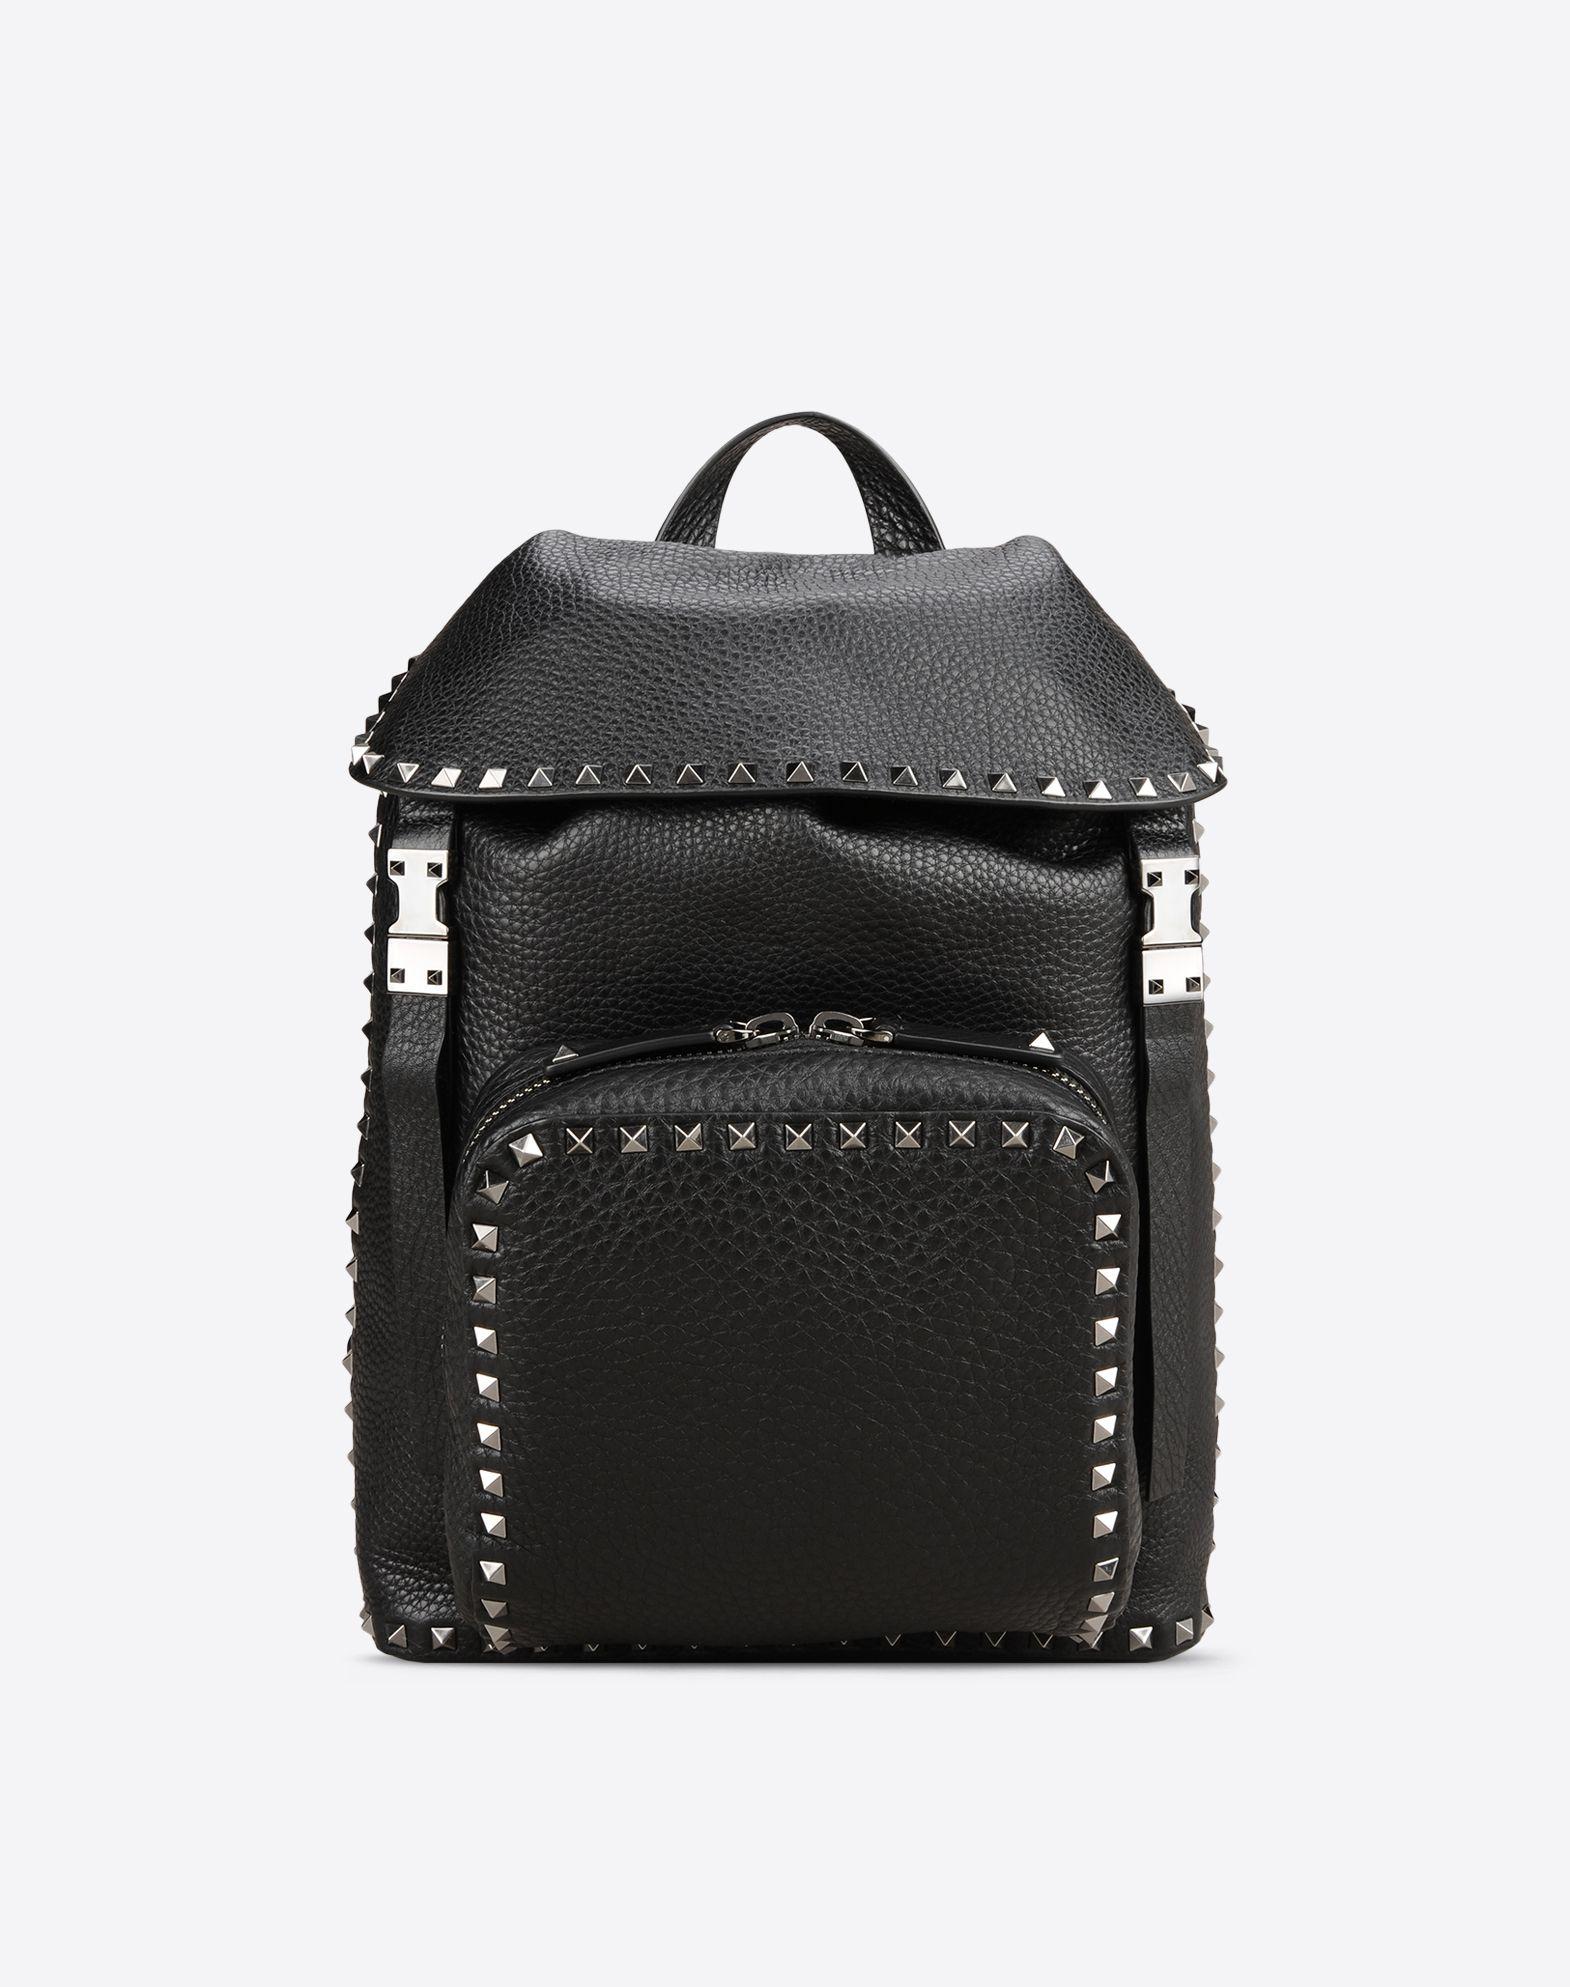 VALENTINO Studs External pocket Textured leather  45318379xh